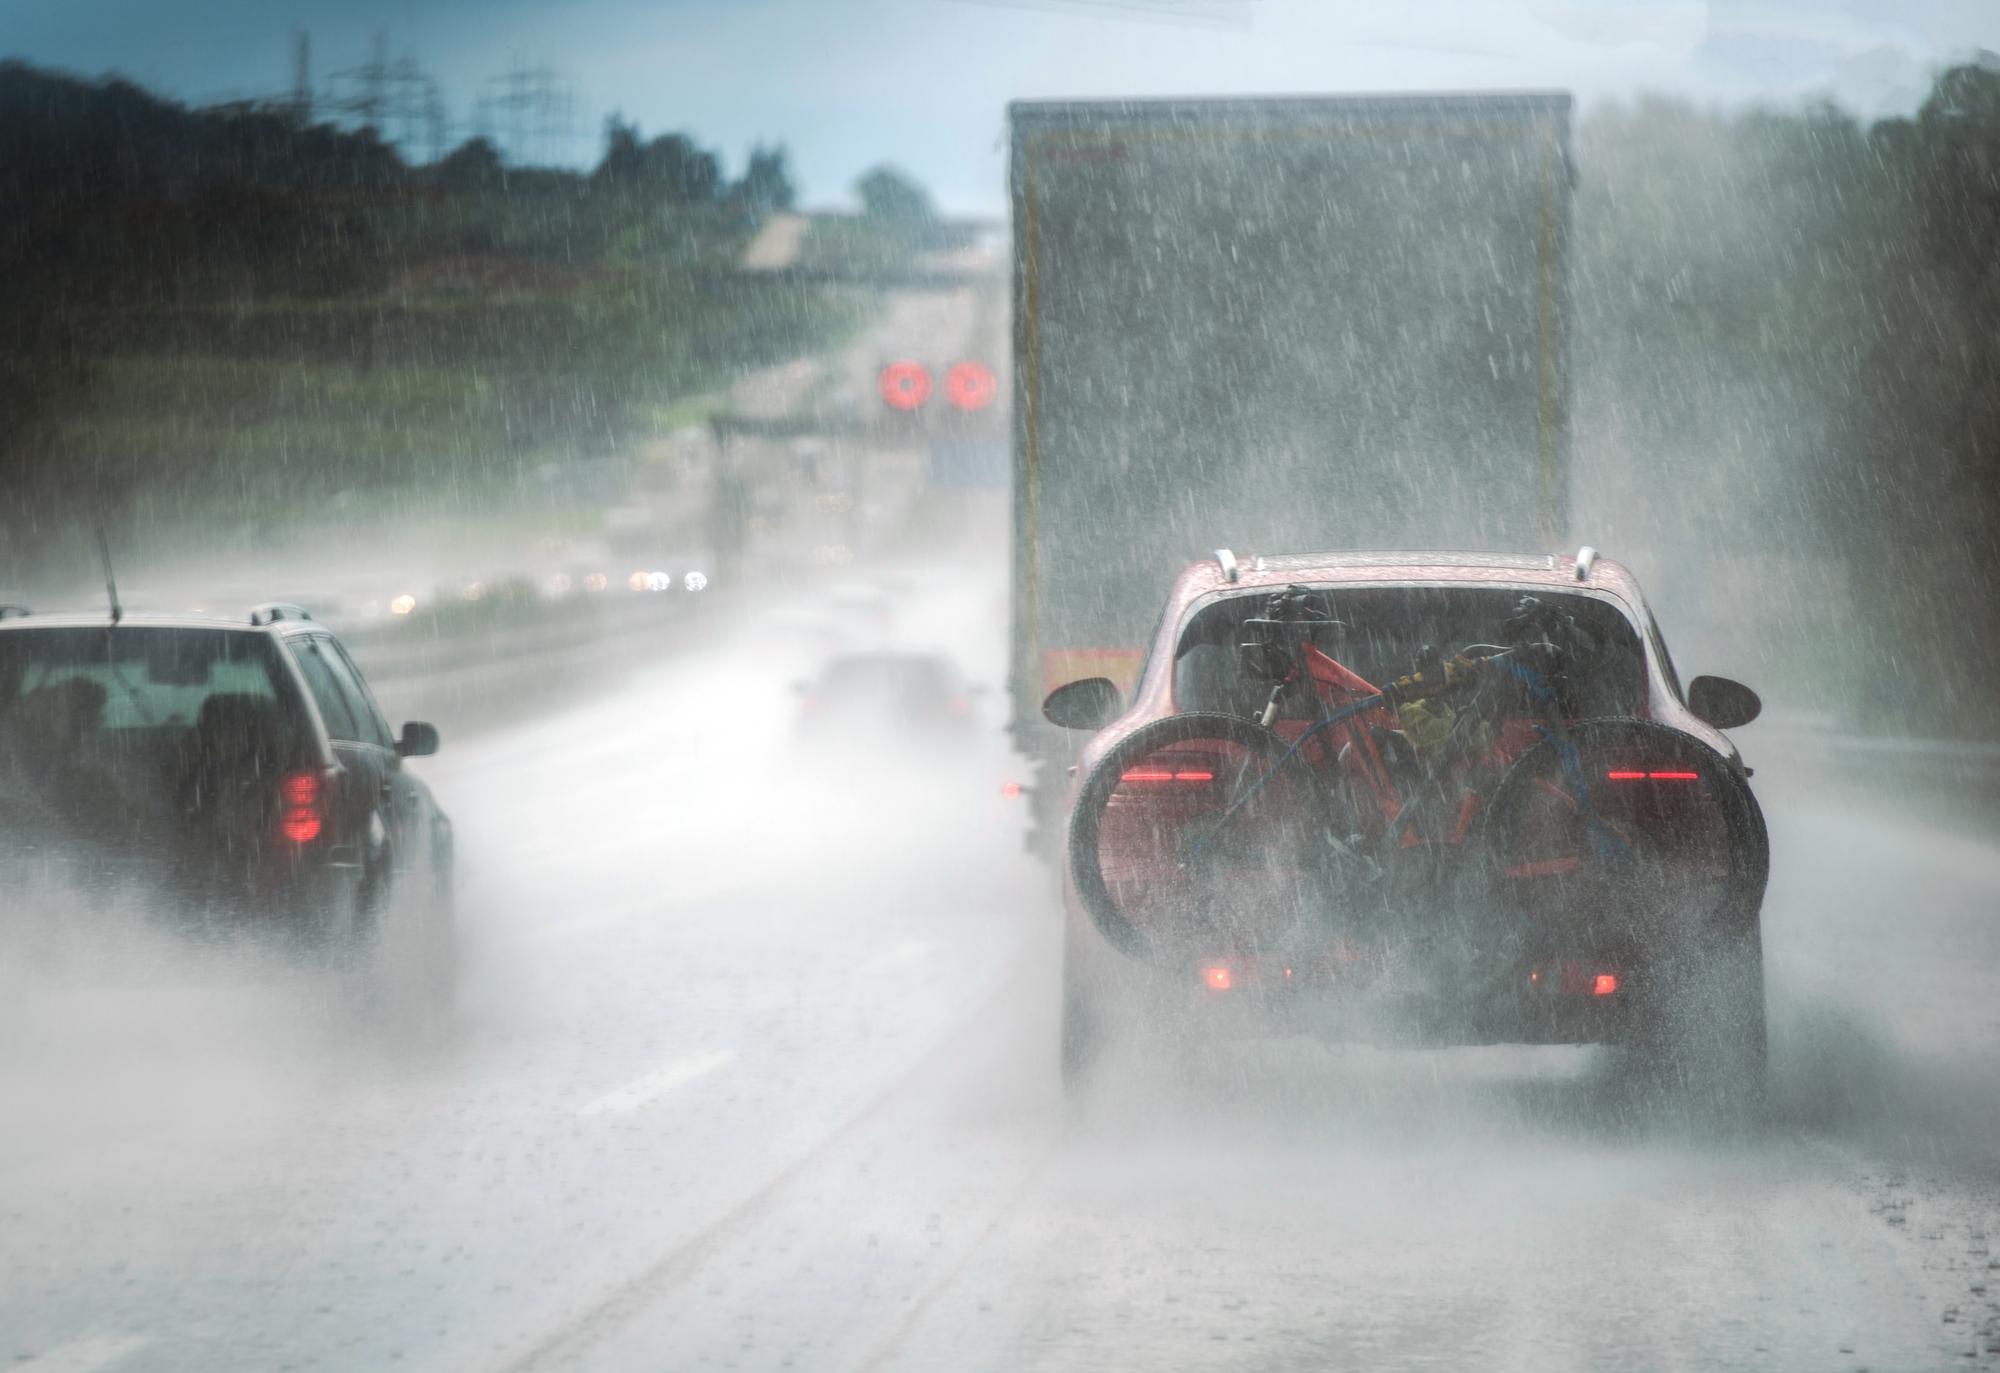 Heavy traffic caught in the rain